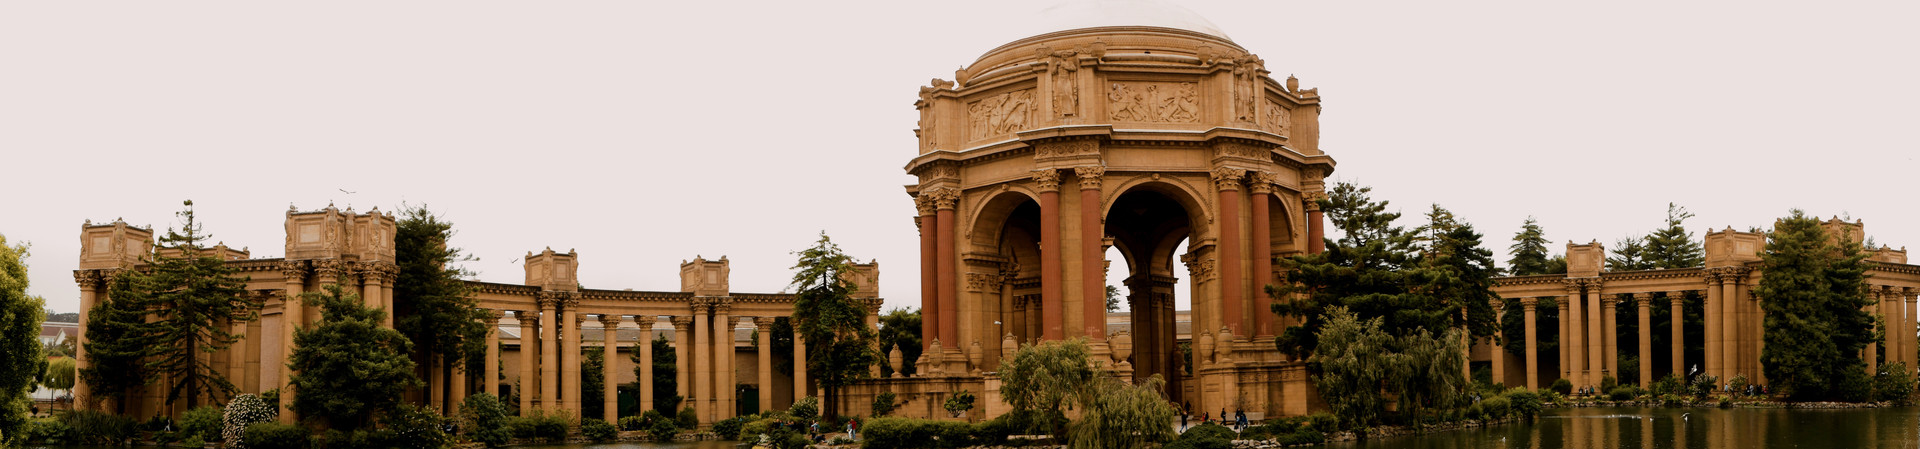 Panorama of the San Francisco  Palace of